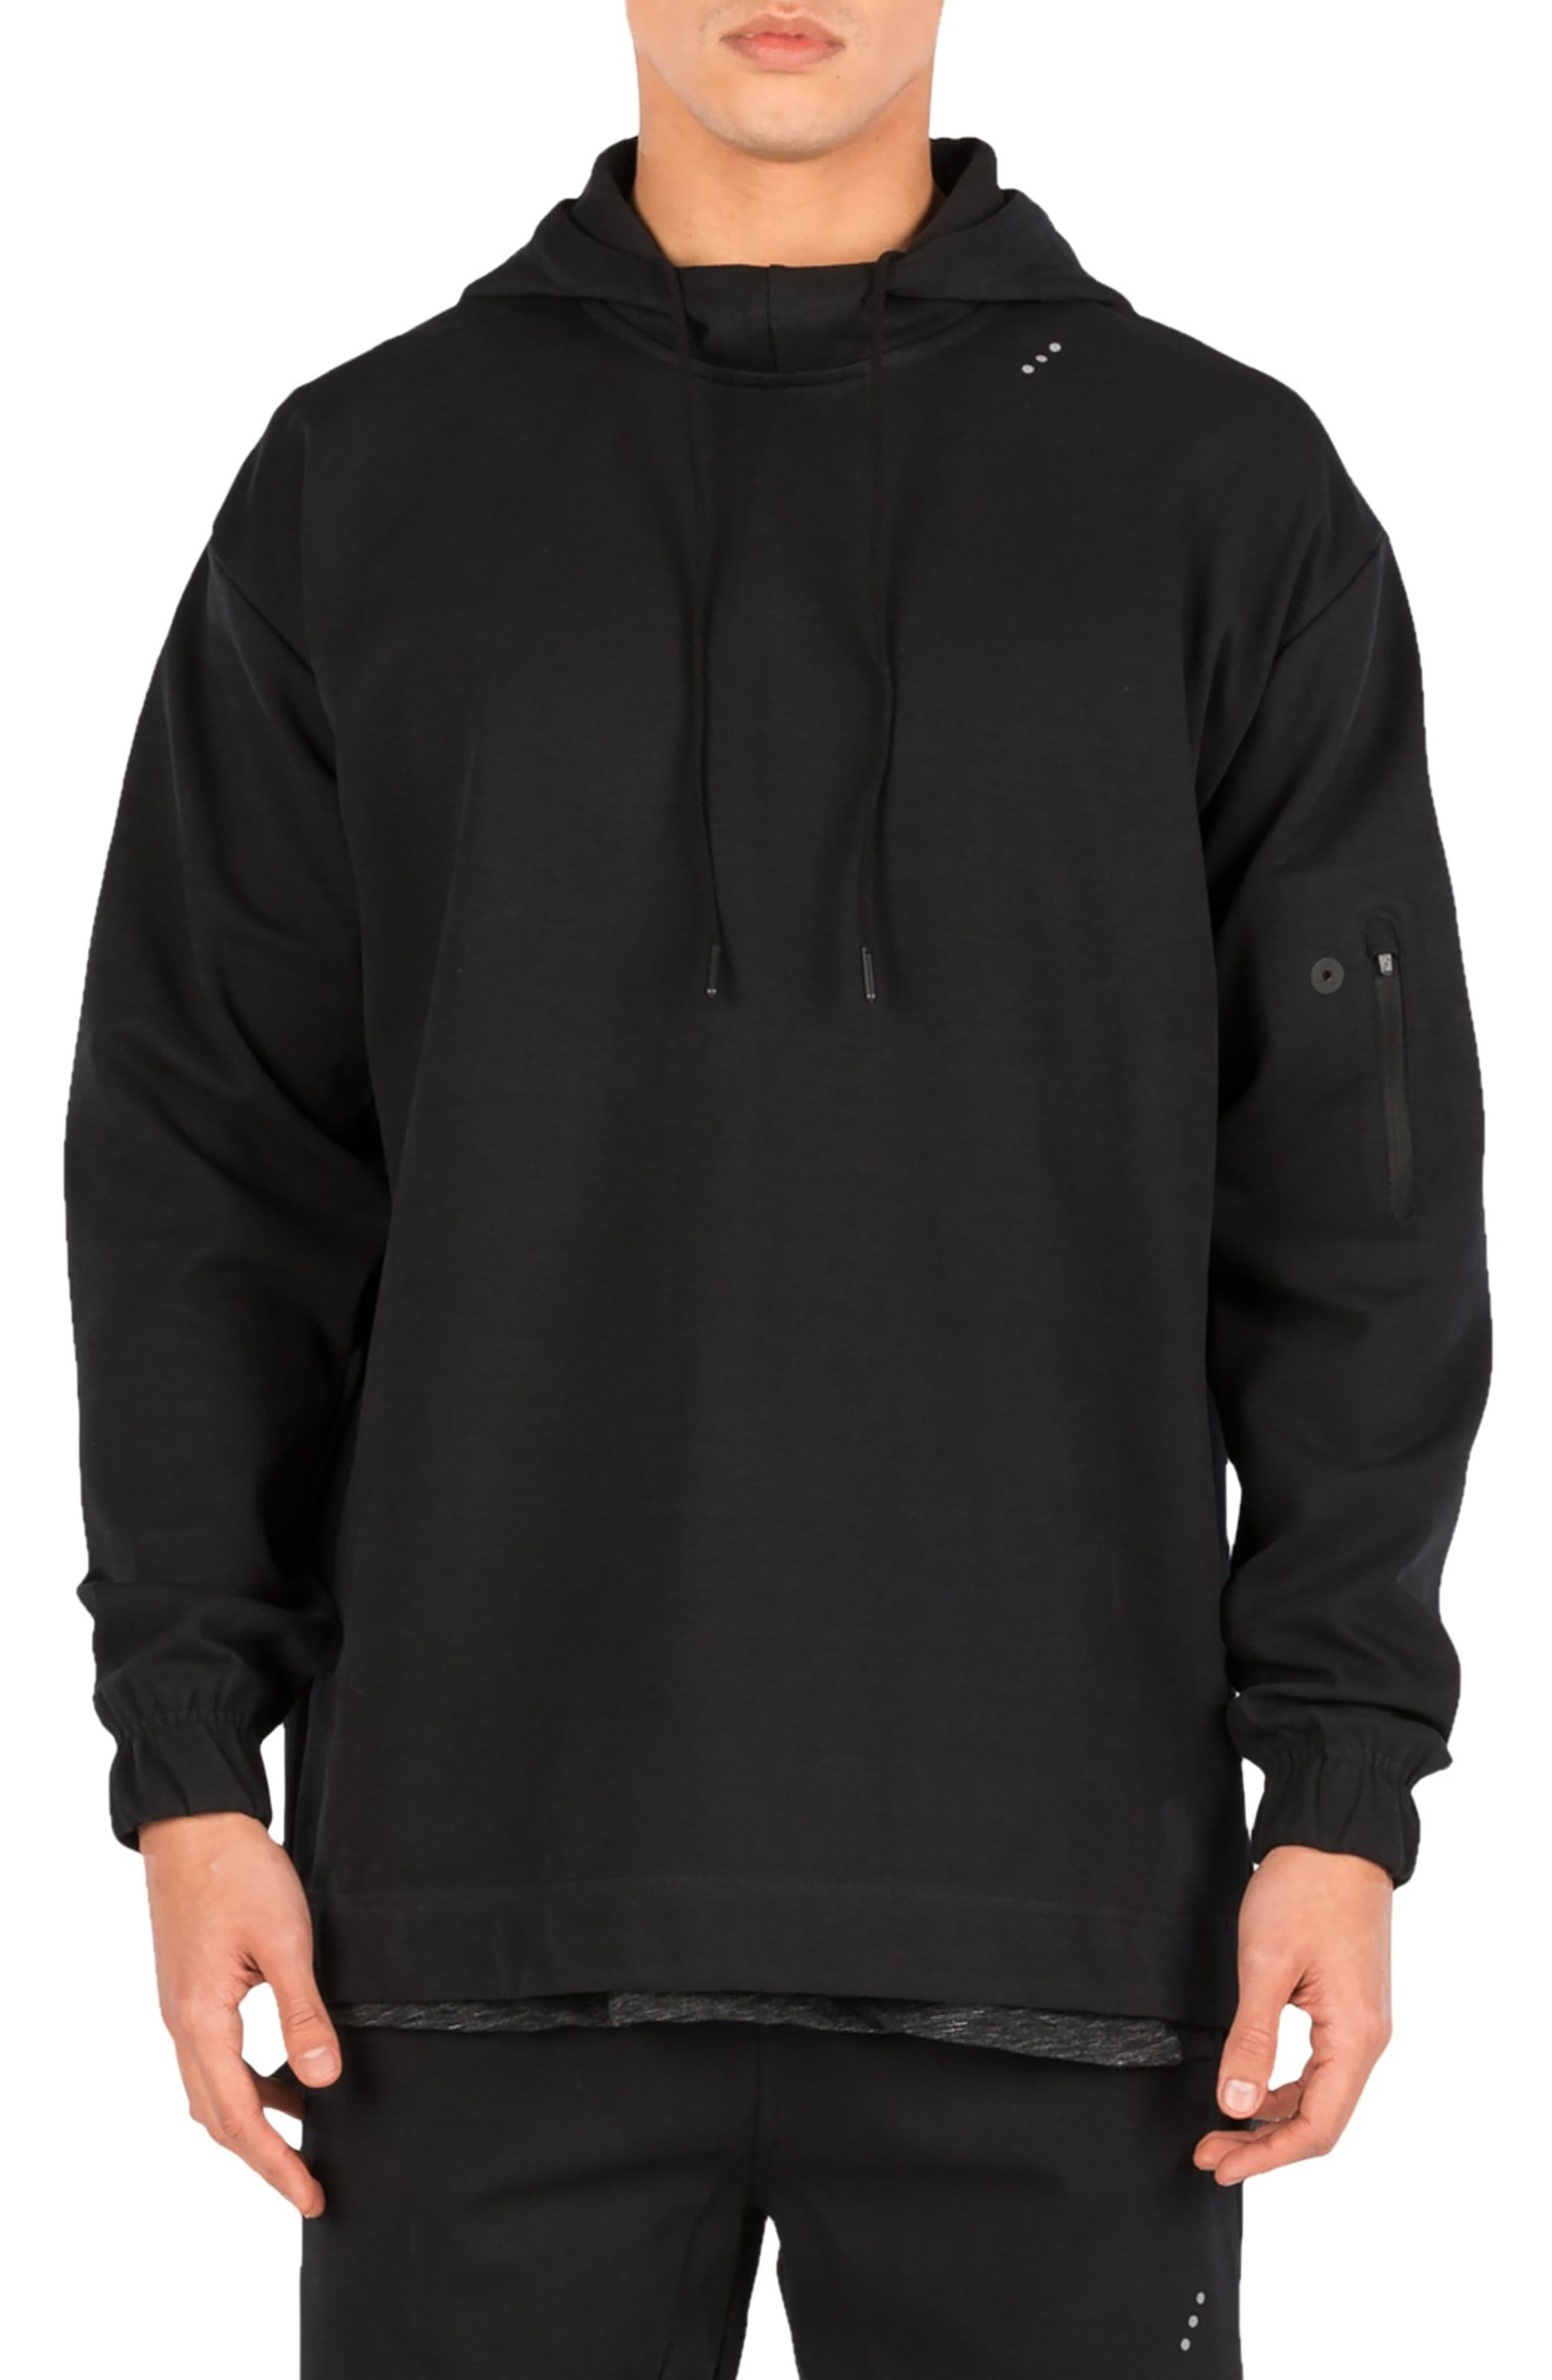 Main Image - ZANEROBE REC Tech Hoodie Sweatshirt